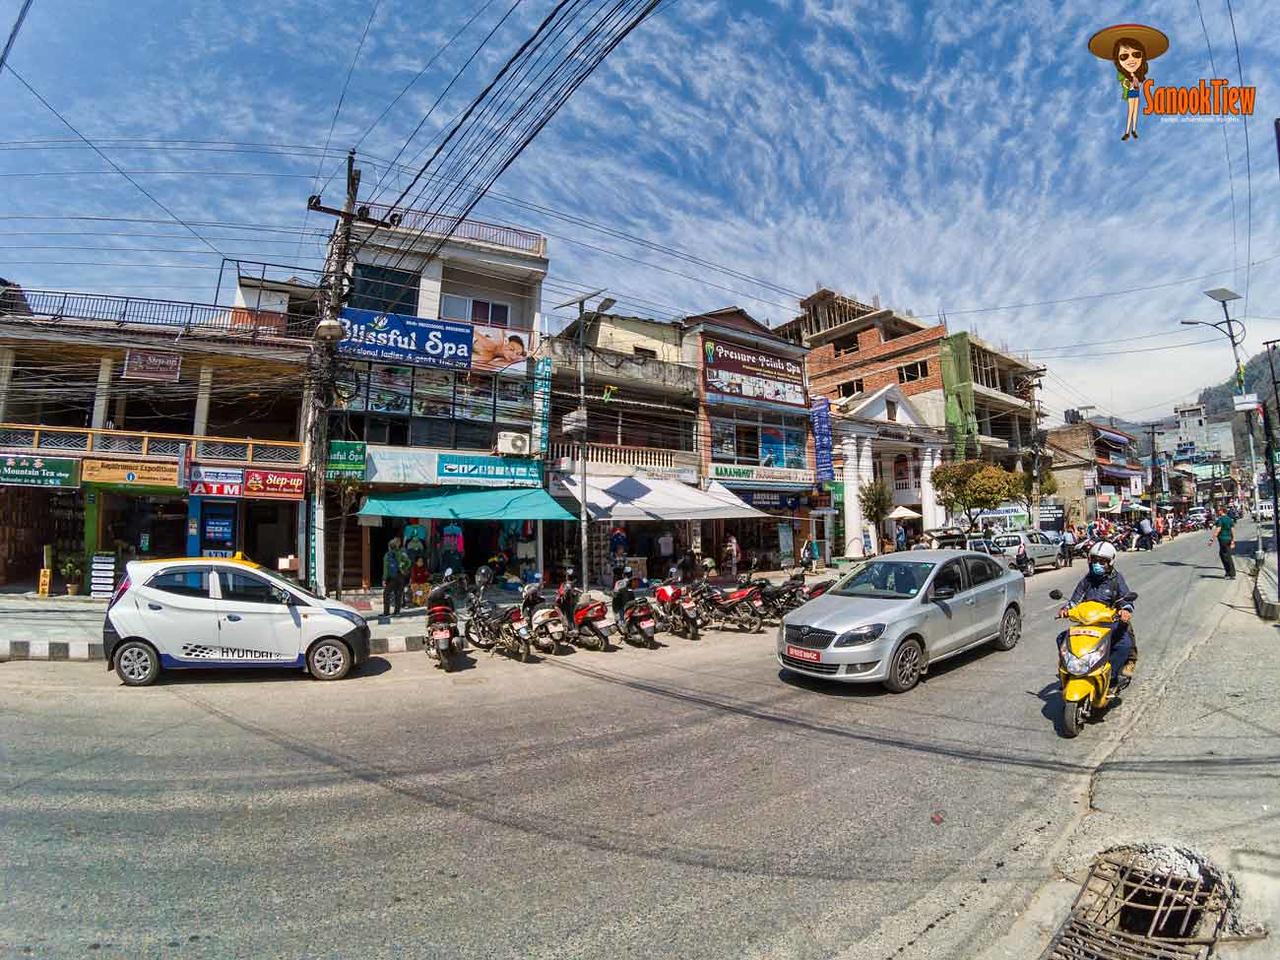 Pokhara โพคารา เที่ยวโพคารา Nepal เนปาล โปคารา